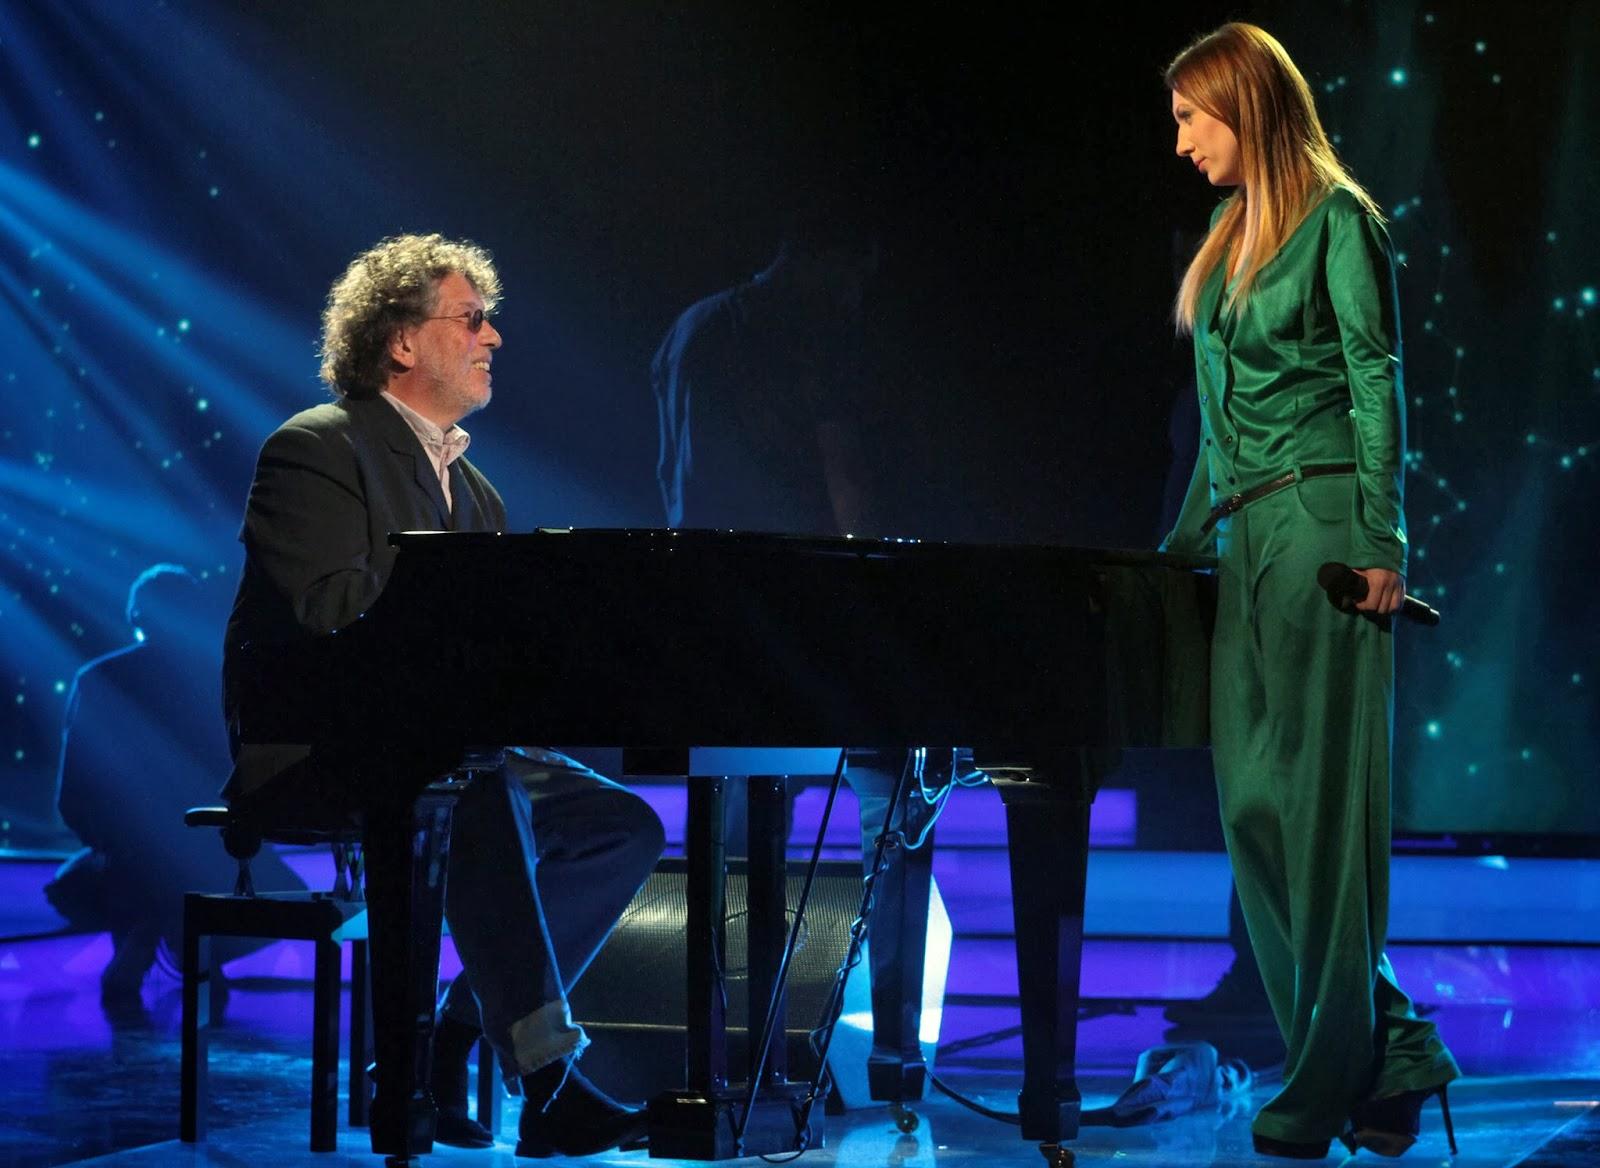 Presser Gábor és Rúzsa Magdi duett koncertje